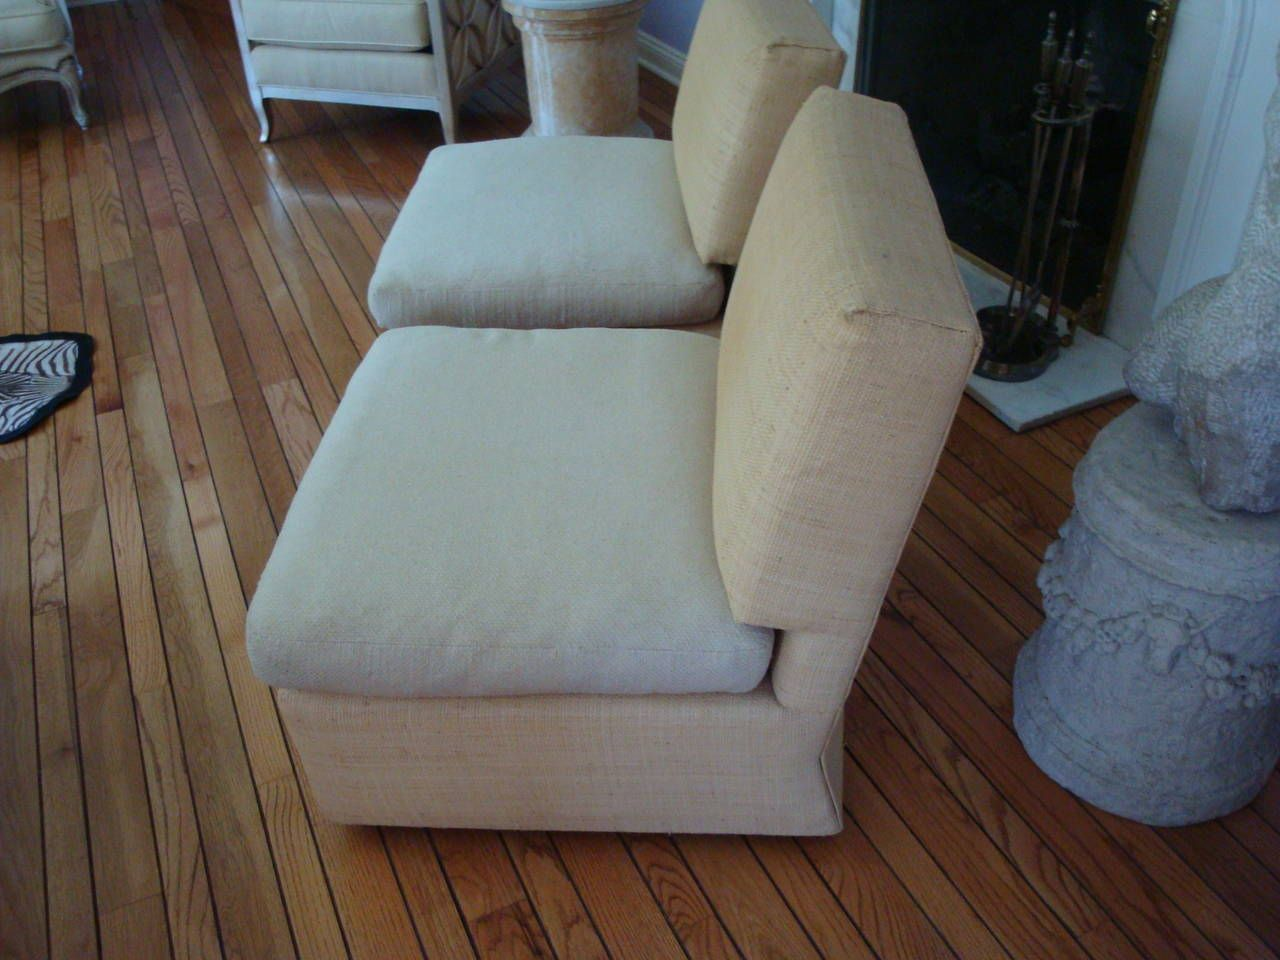 Tremendous Billy Baldwin Vintage Raffia Slipper Chairs Arm Chairs Theyellowbook Wood Chair Design Ideas Theyellowbookinfo